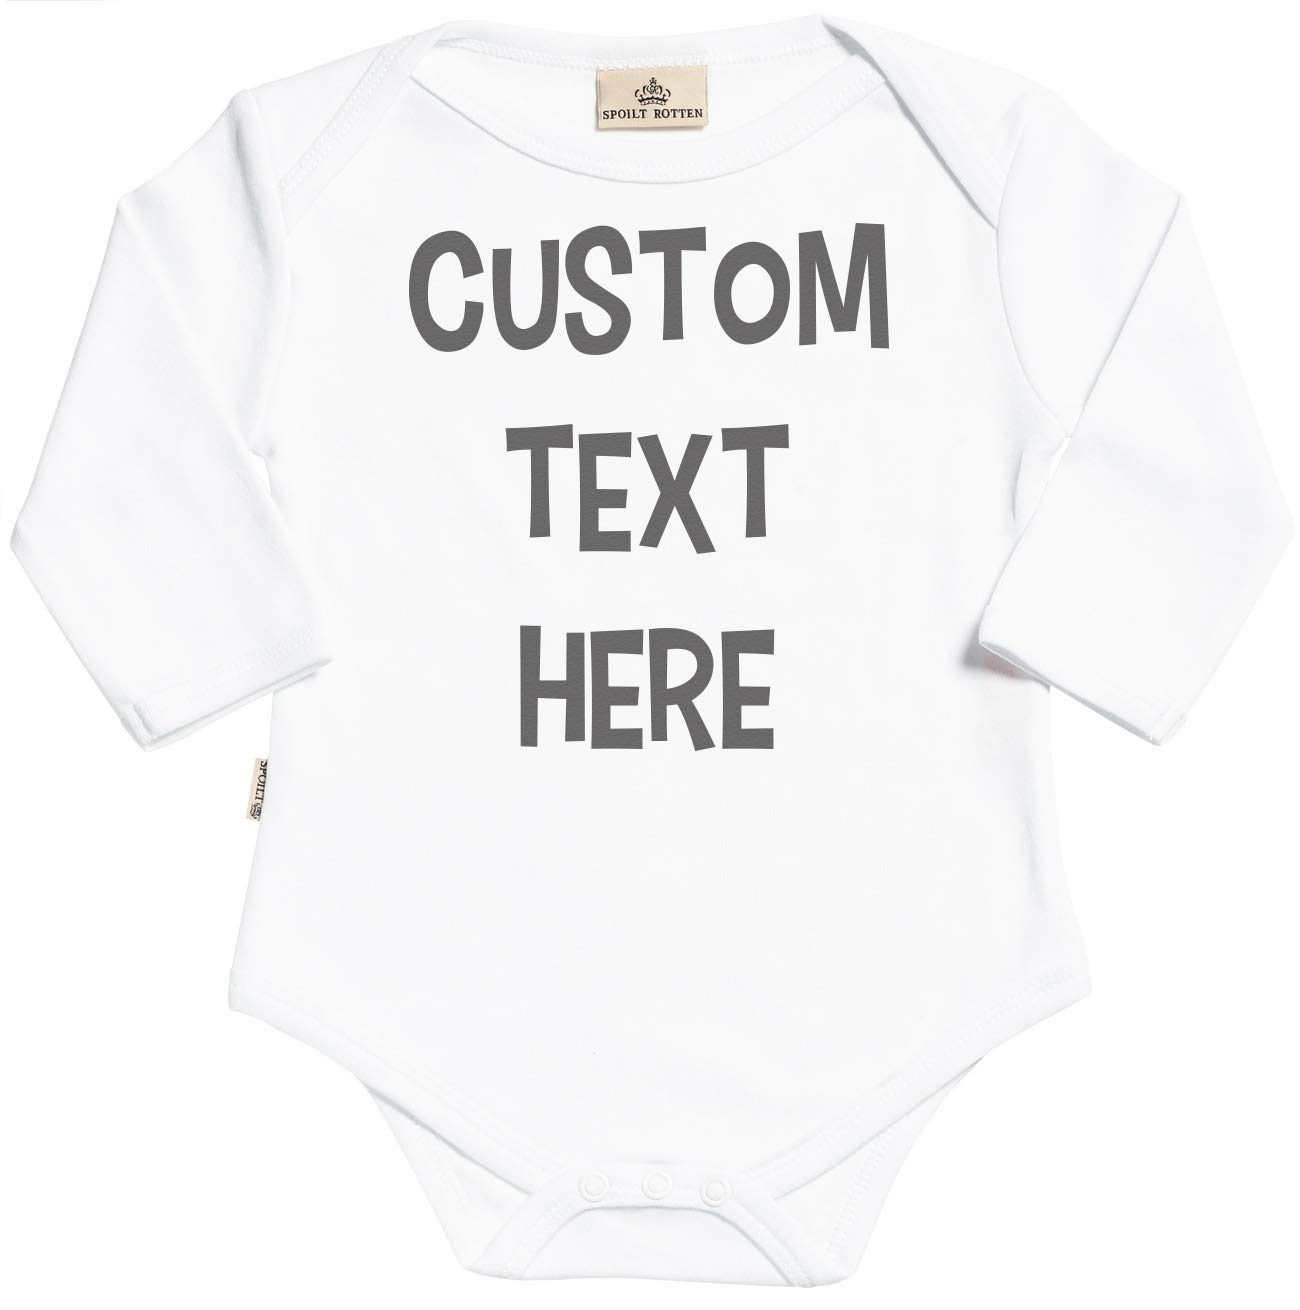 Personalised Baby Gift in Keepsake Gift Carton /& Teddy SR Custom Text Here Text Organic Baby Grow 0-6M White